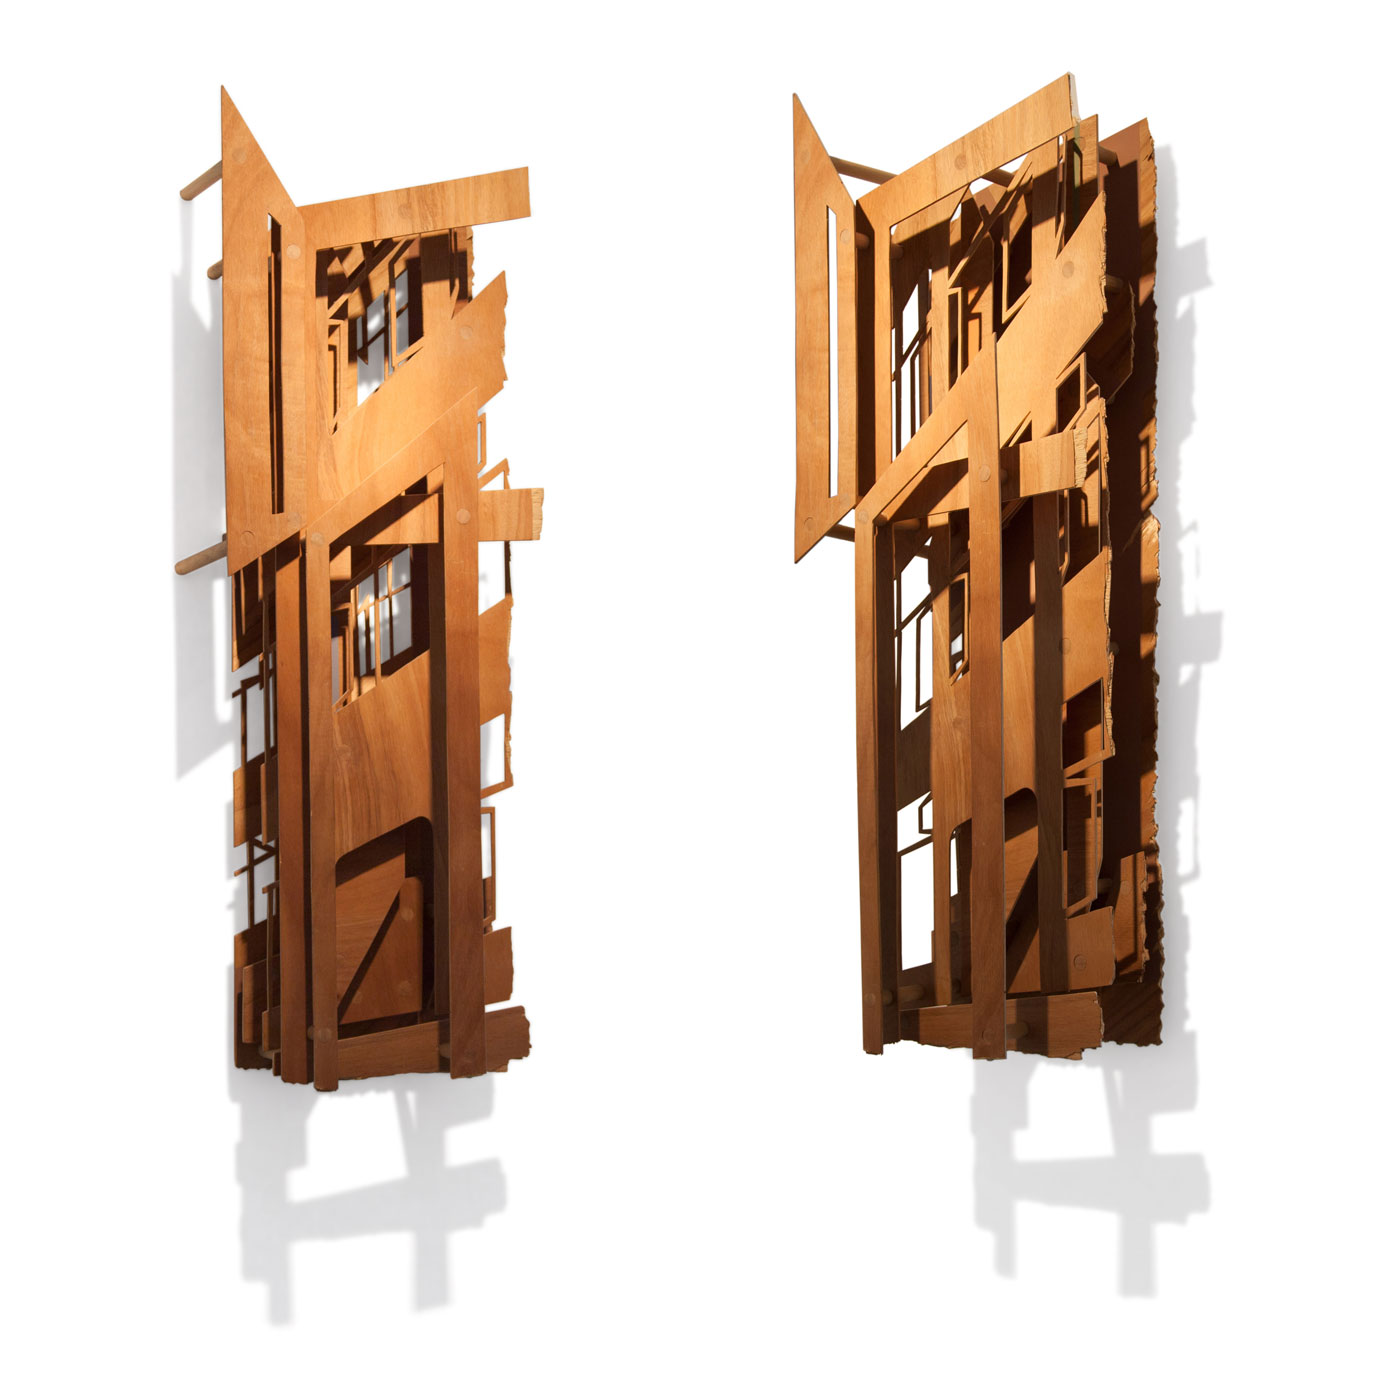 VASISTAS - cutout I, © 2009, oiled plywood and acrylic paint, 100 x 40 x 25 cm